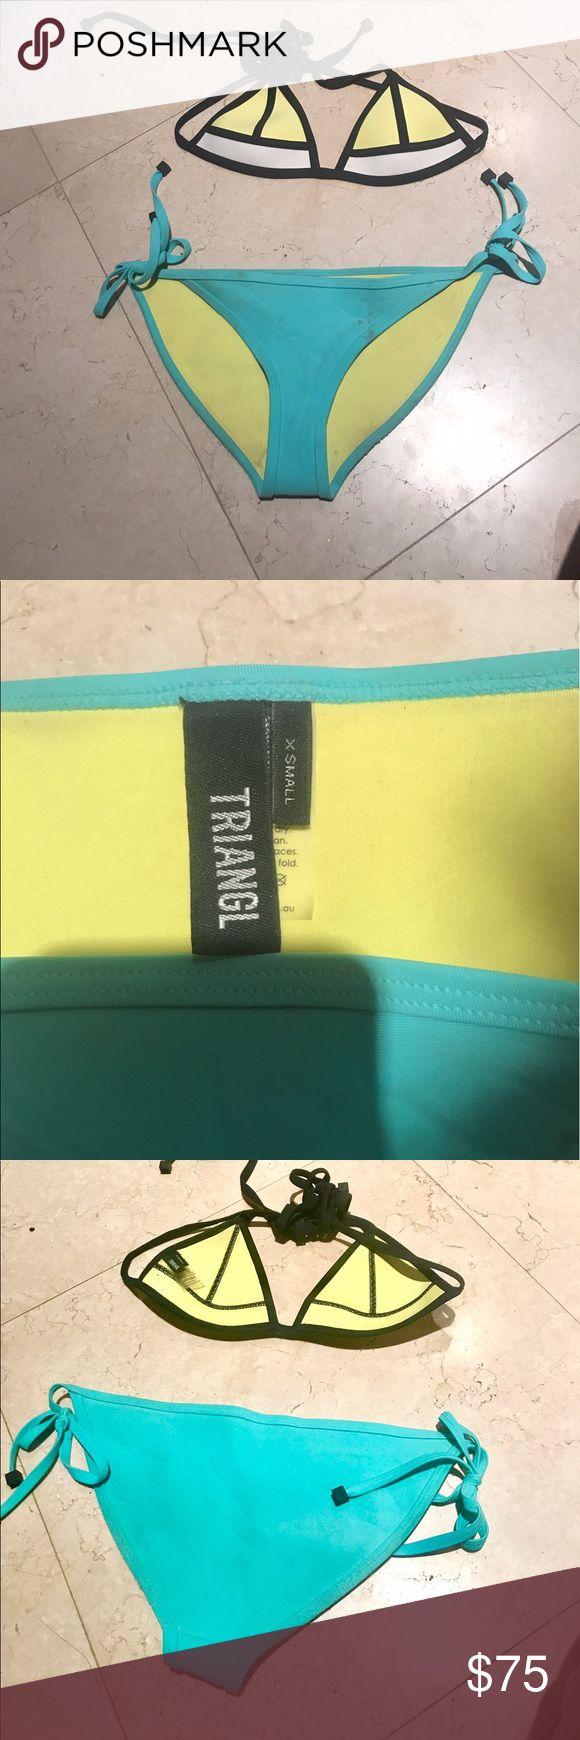 Triangl swimwear bikini set - XS Blue bottoms with yellow and white triangle top. Worn less than five times. Great condition! triangl swimwear Swim Bikinis